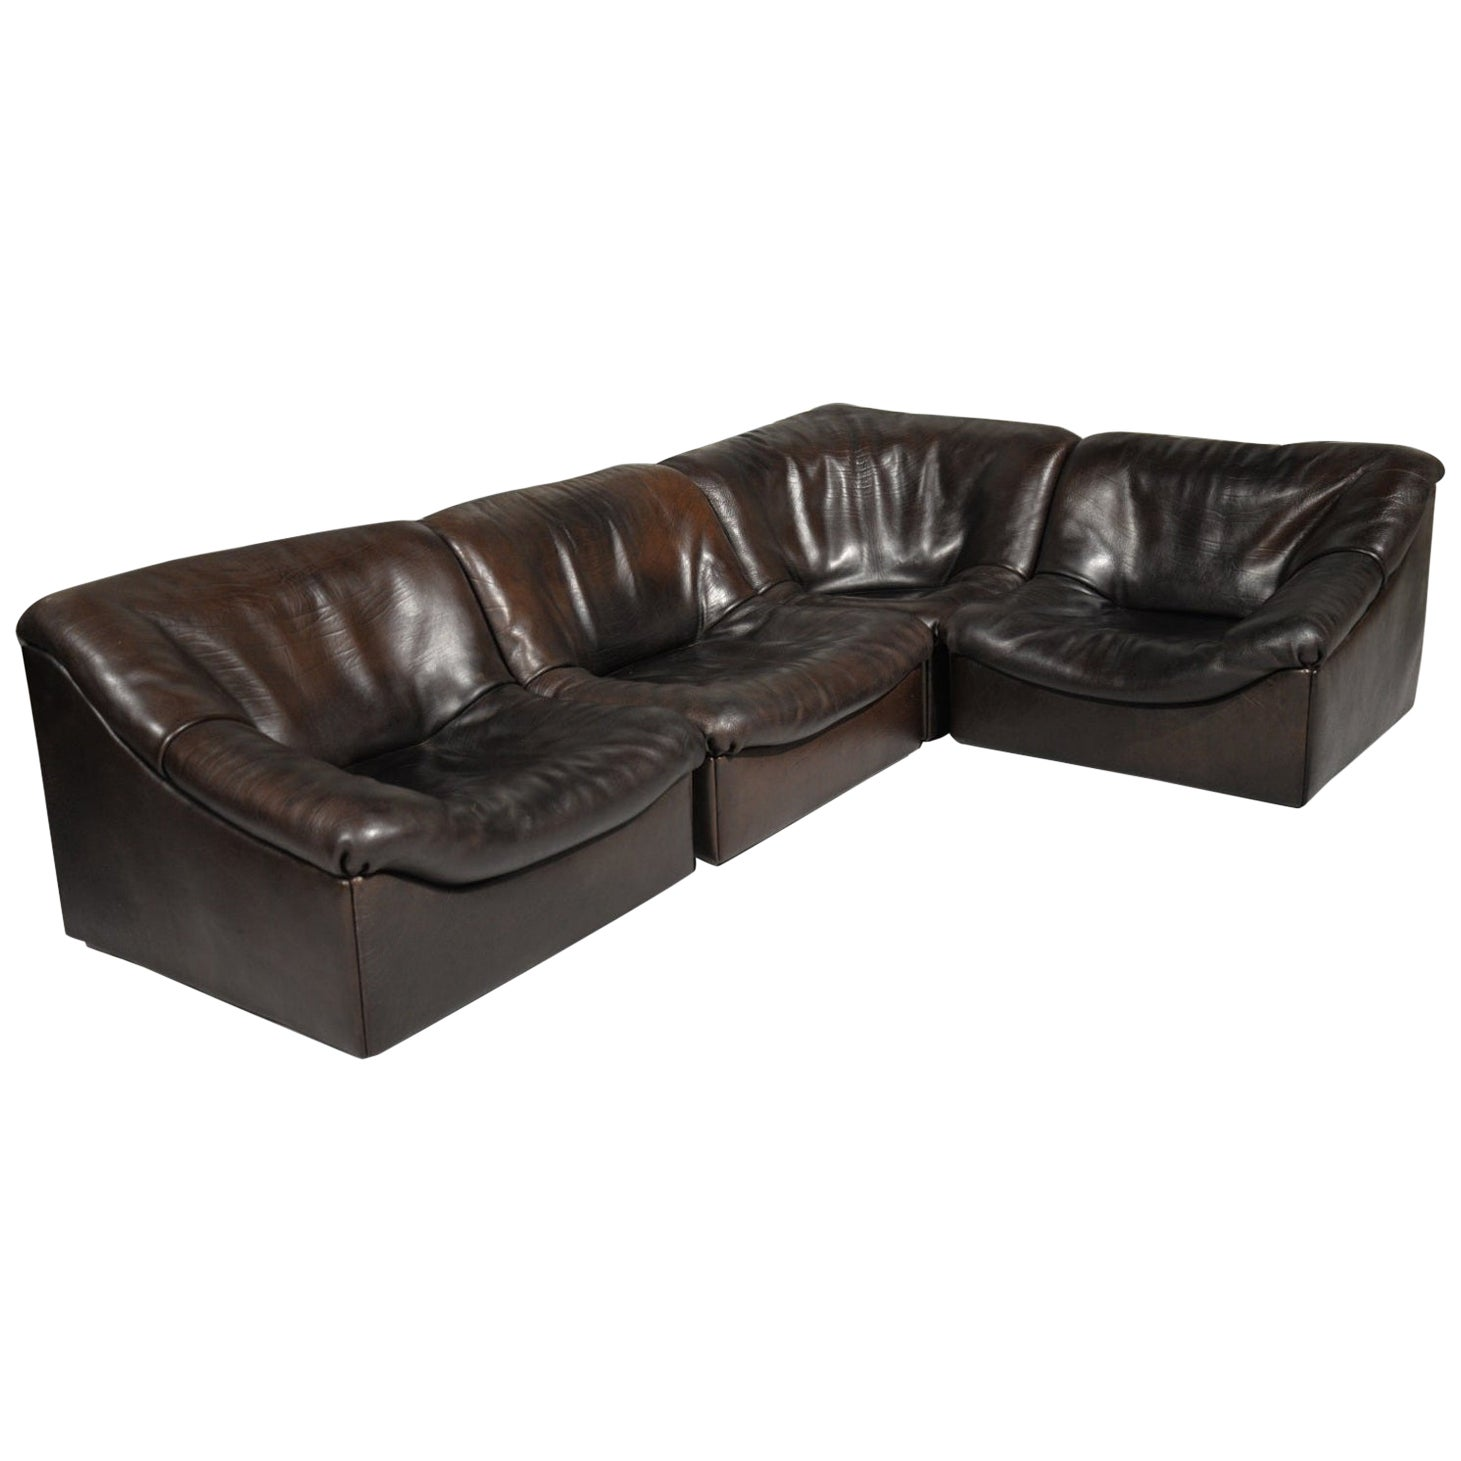 "Modular ""DS46"" Buffalo Leather Sofa by De Sede, Switzerland, 1970s"